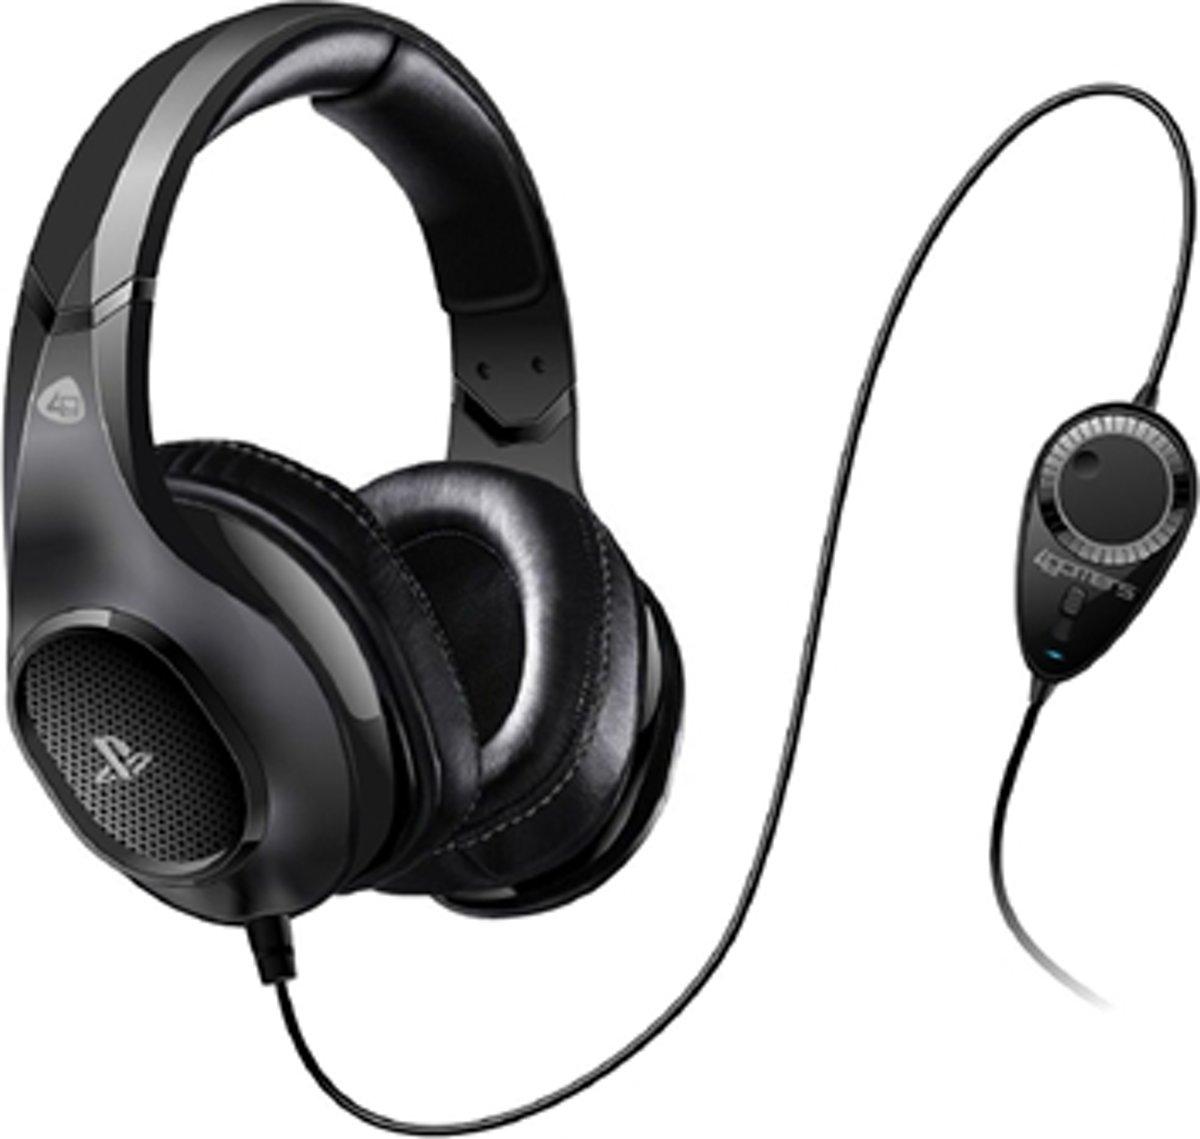 PS4 Pemium Stereo Gaming headset